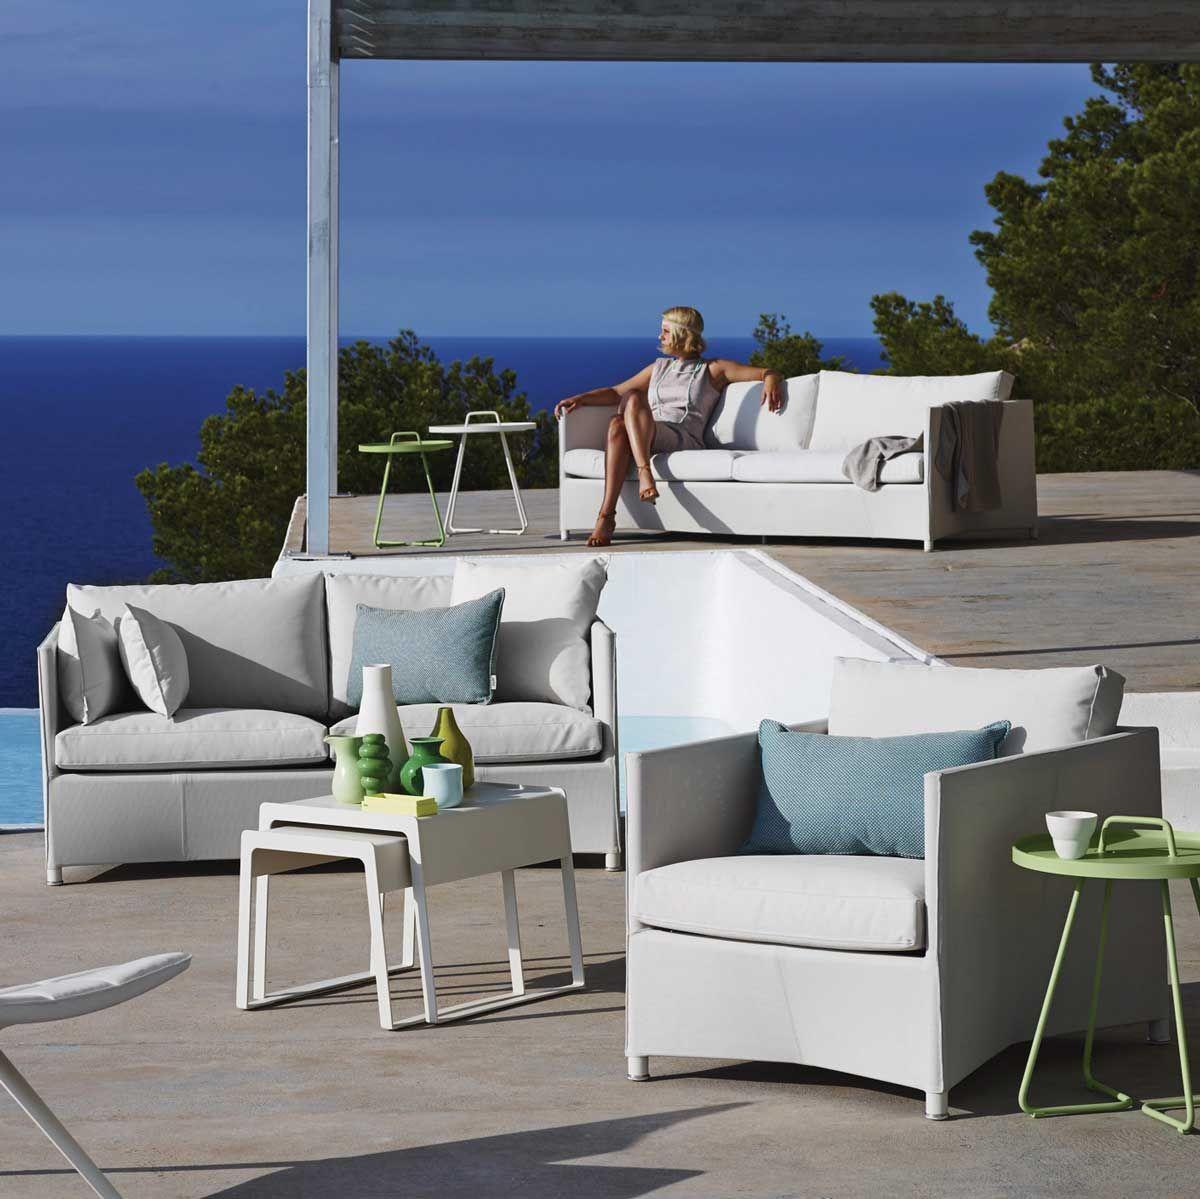 Portofino lounge chair | Love seat, Outdoor furniture sets ...